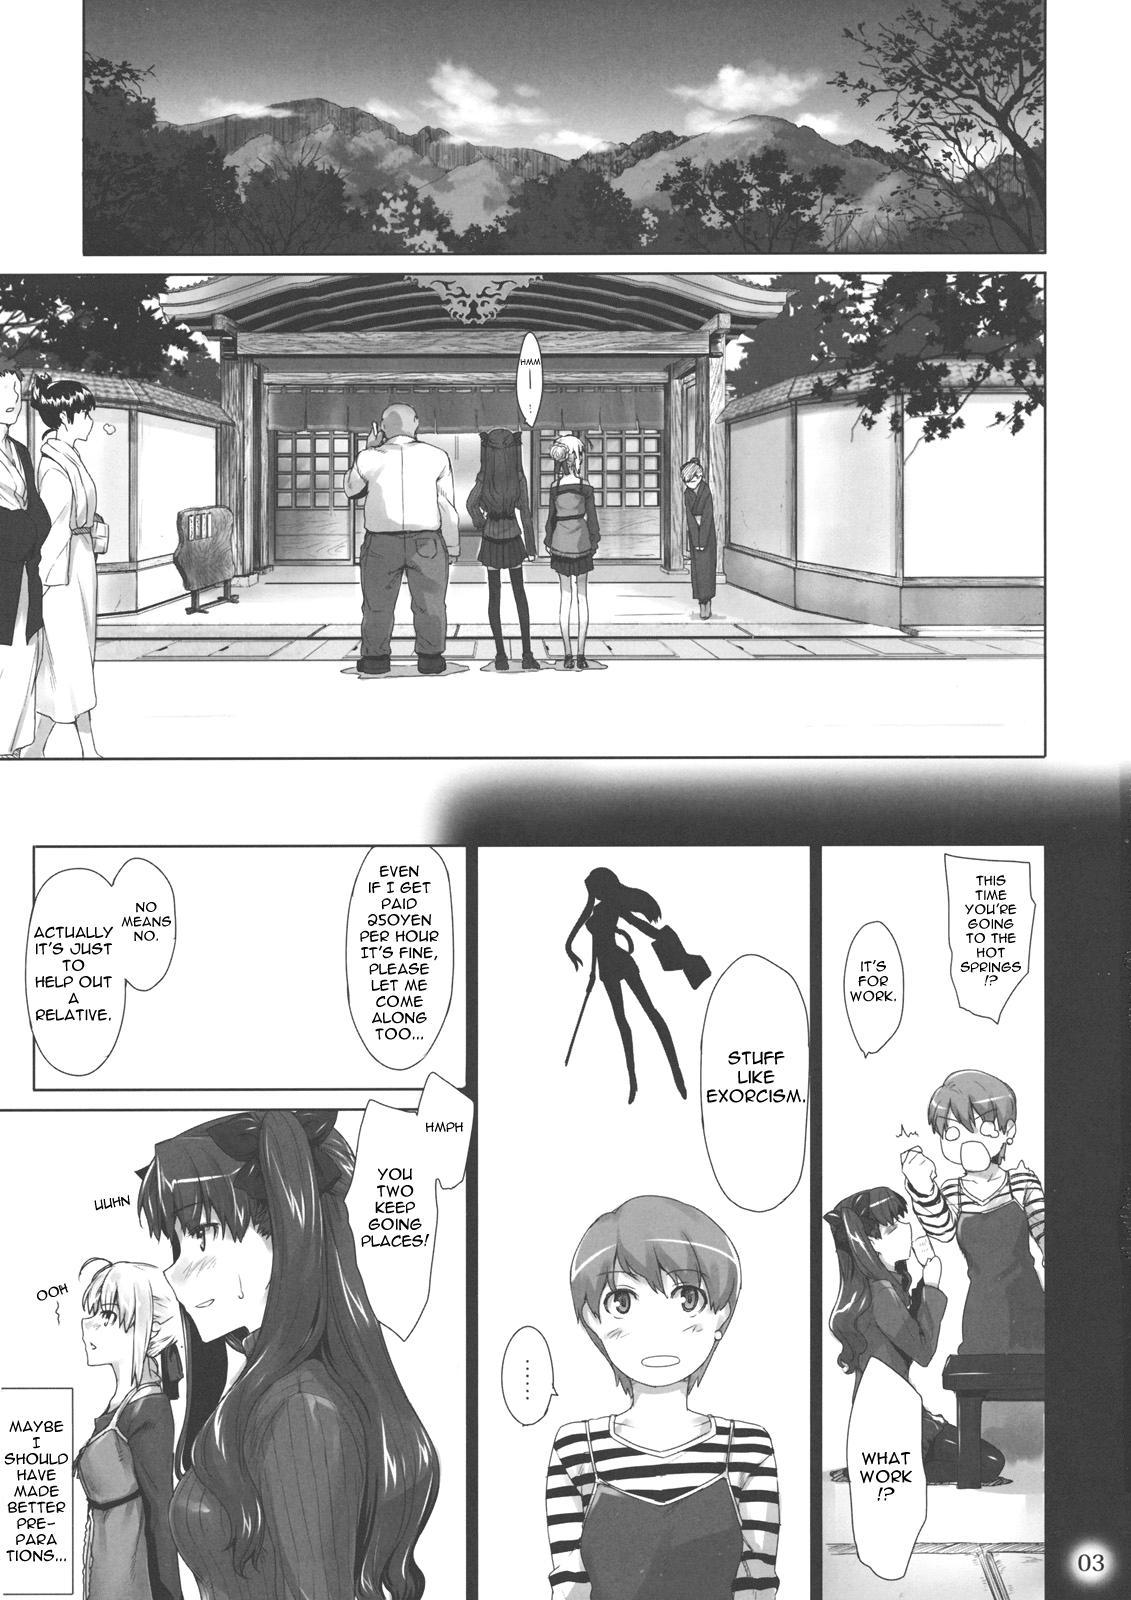 Tosaka-ke no Kakei Jijou 8 1